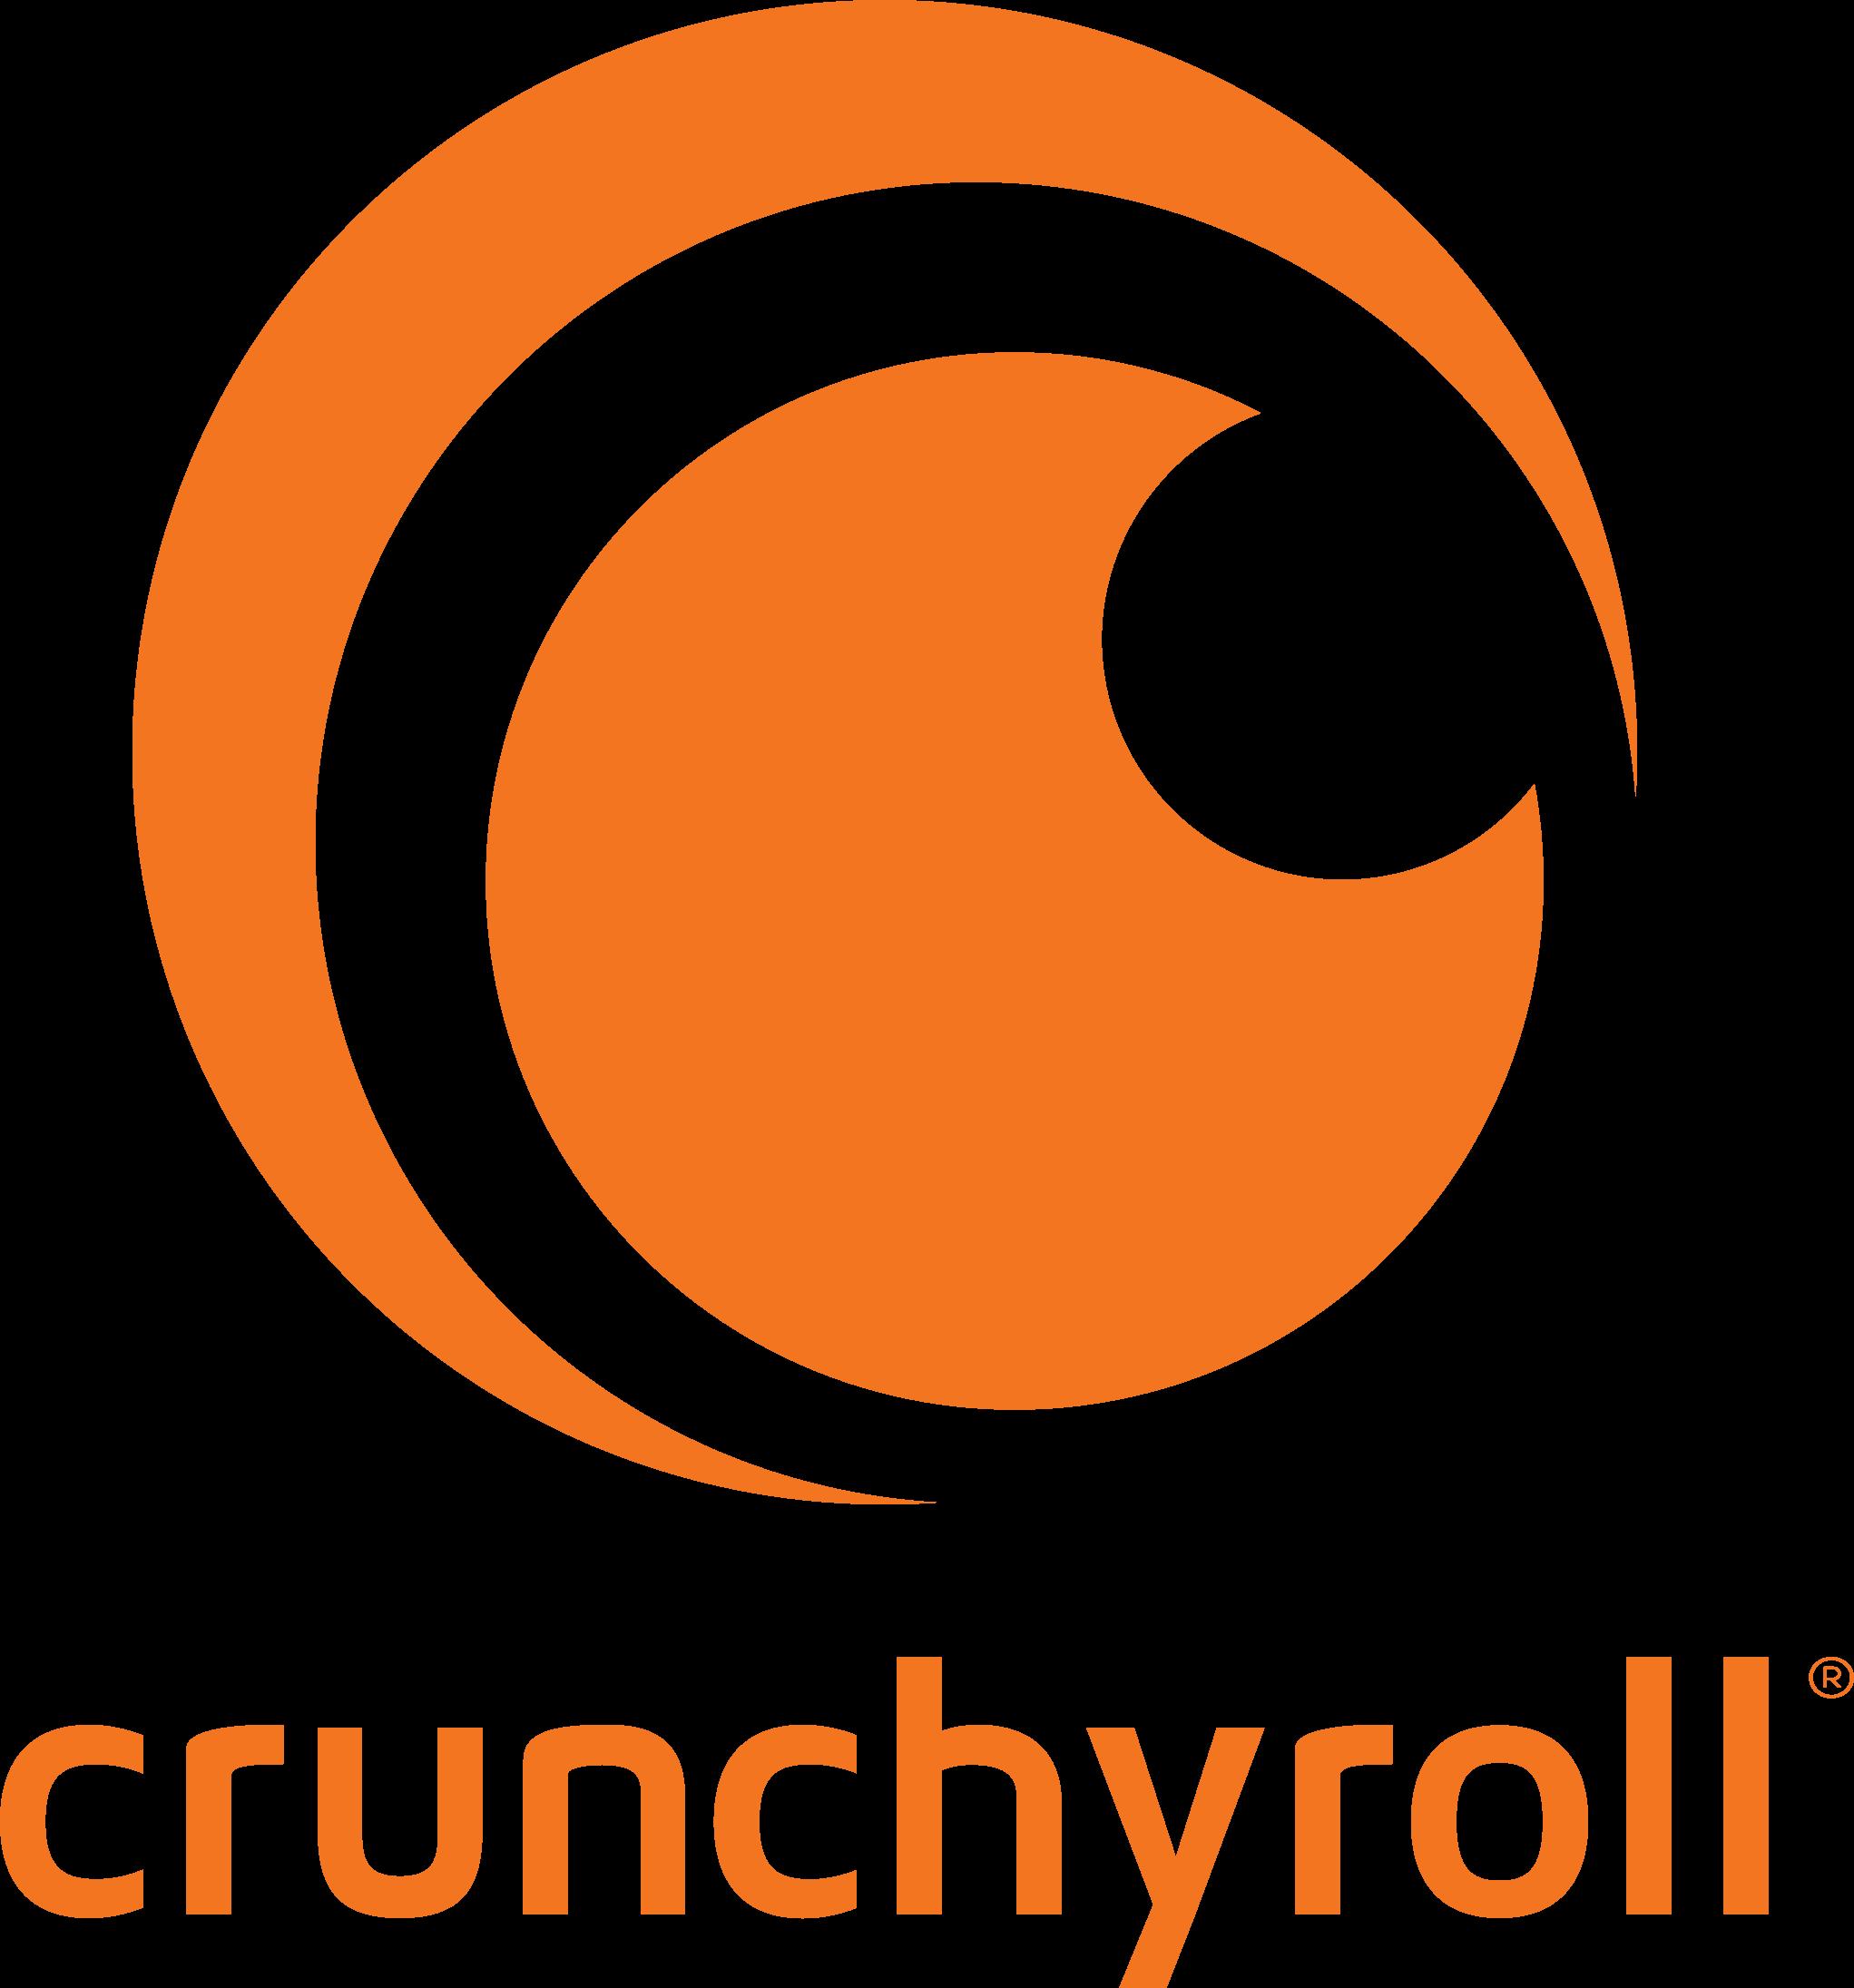 Crunchyroll Presents: JUJUTSU KAISEN Ep1-3 Screening